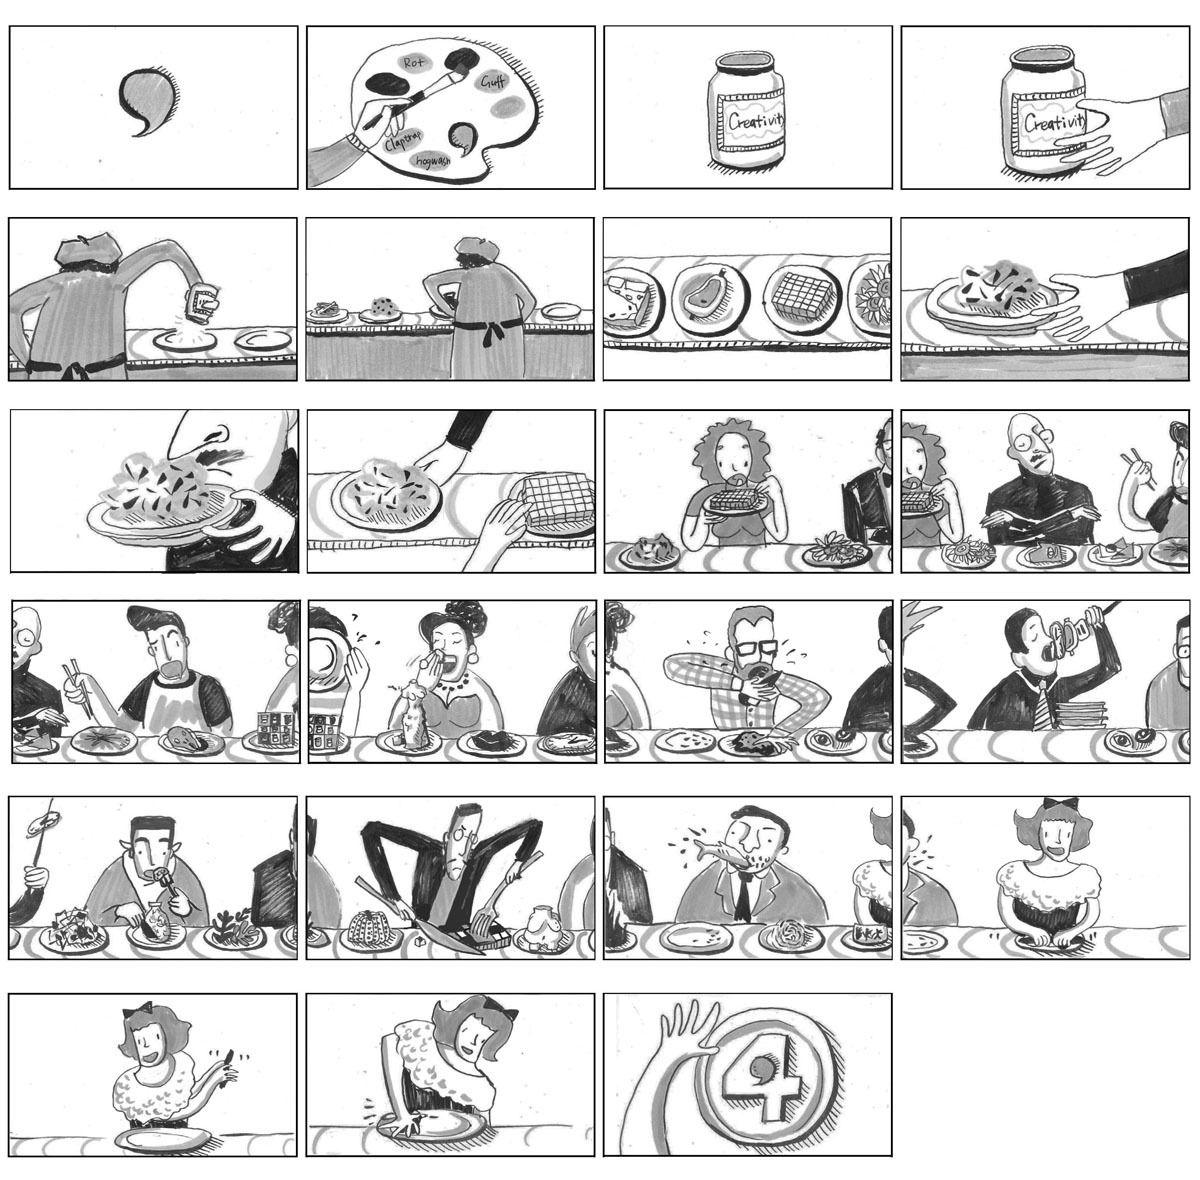 6_storyboard